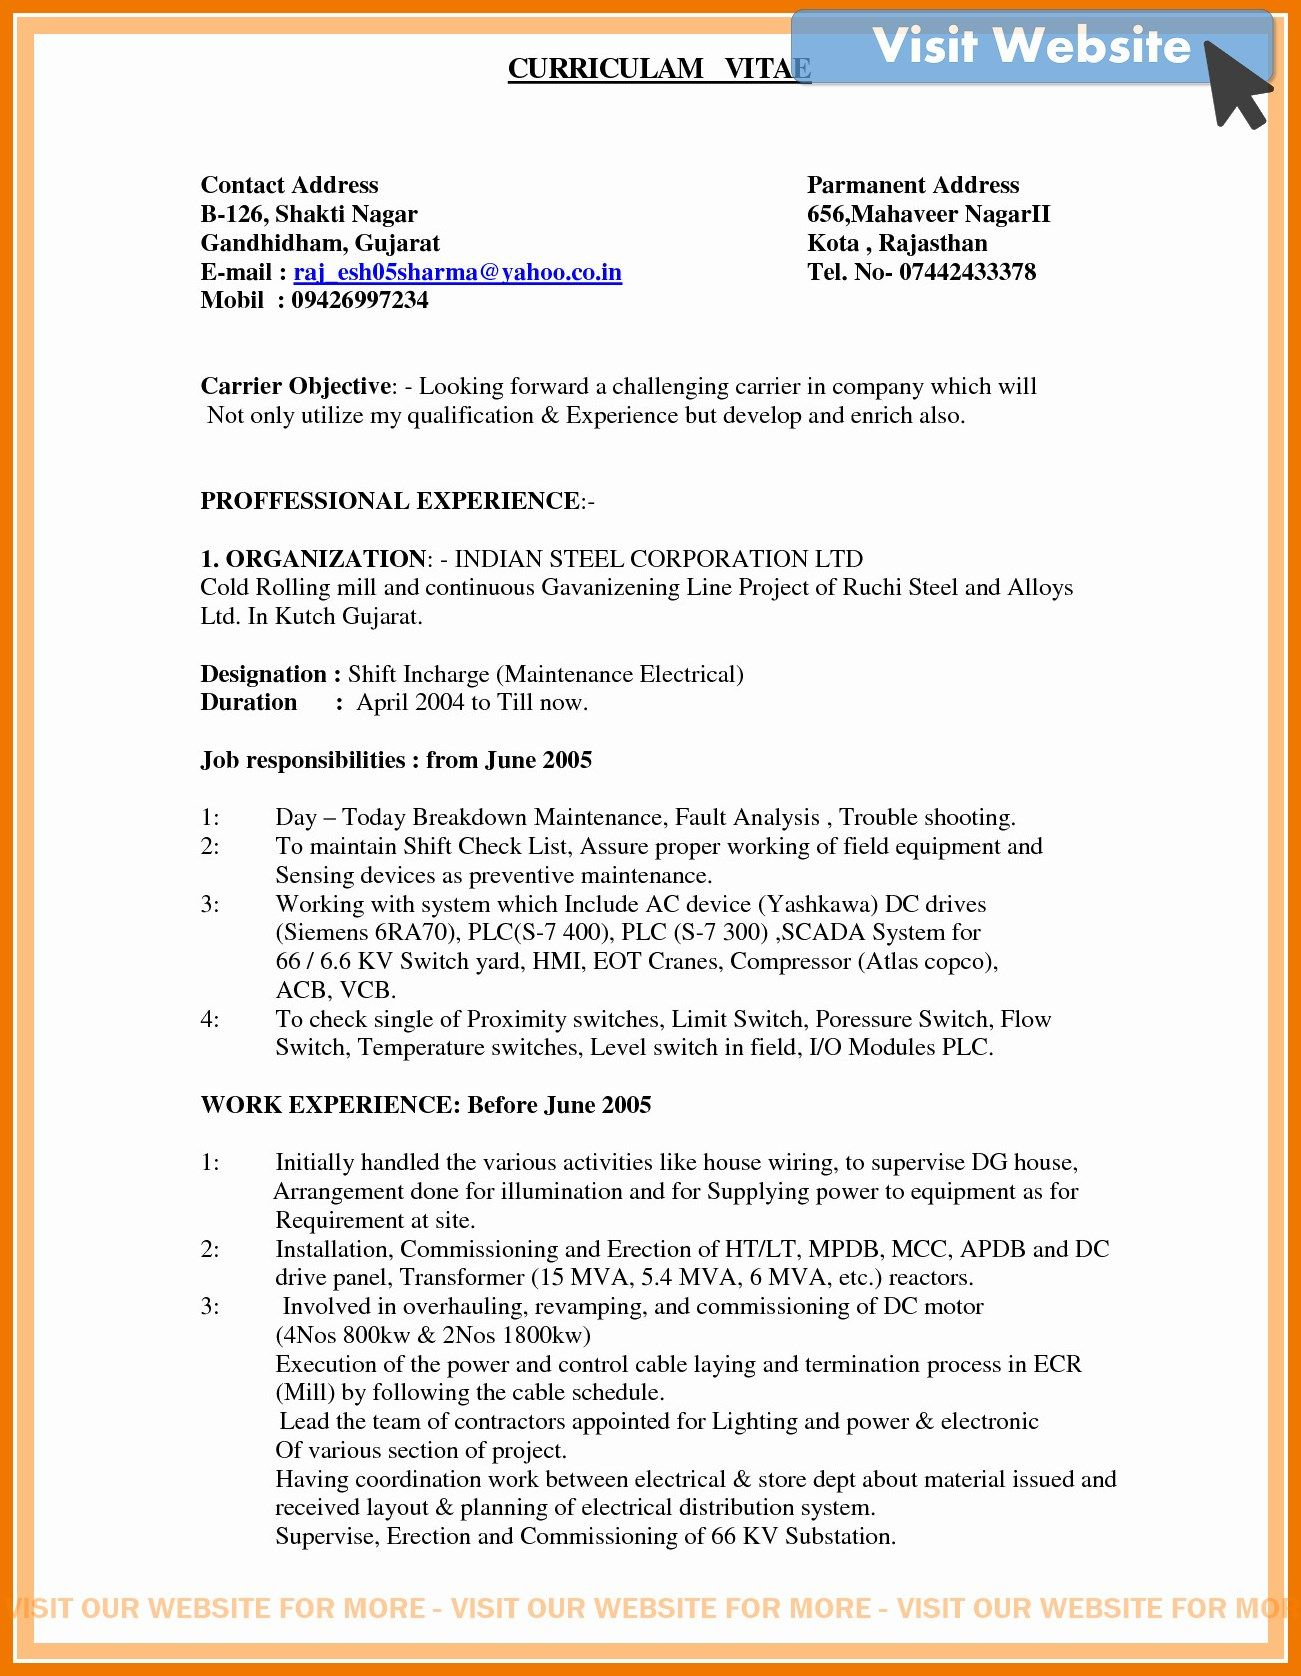 Insurance Broker Cover Letter Examples In 2020 Cover Letter Example Cover Letter Design Cover Letter Tips